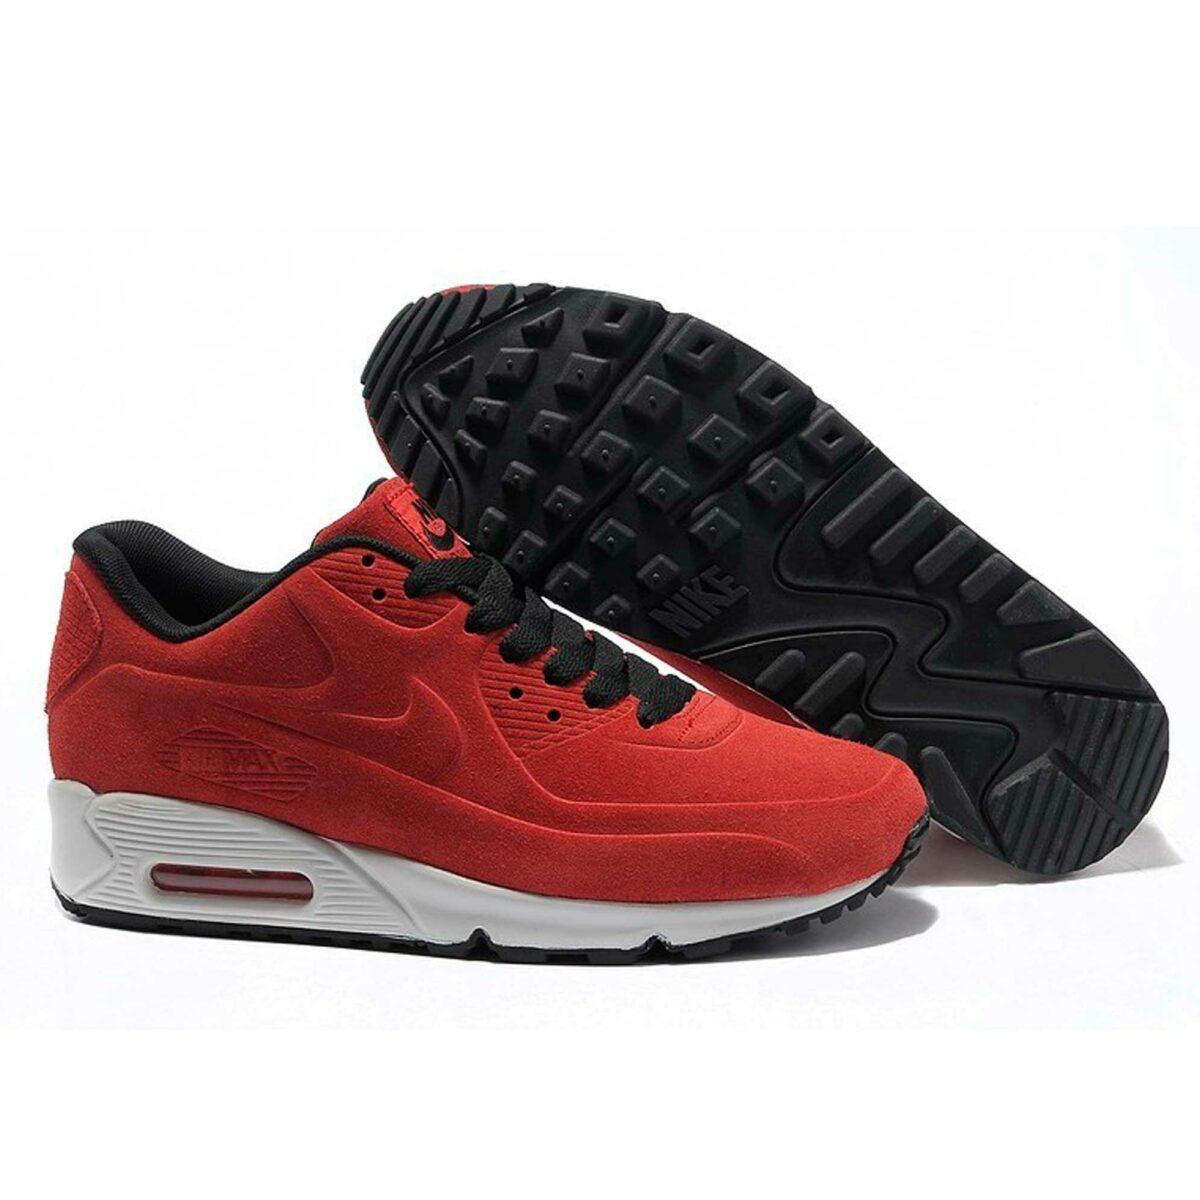 nike air max 90 VT red black 472489_601 купить